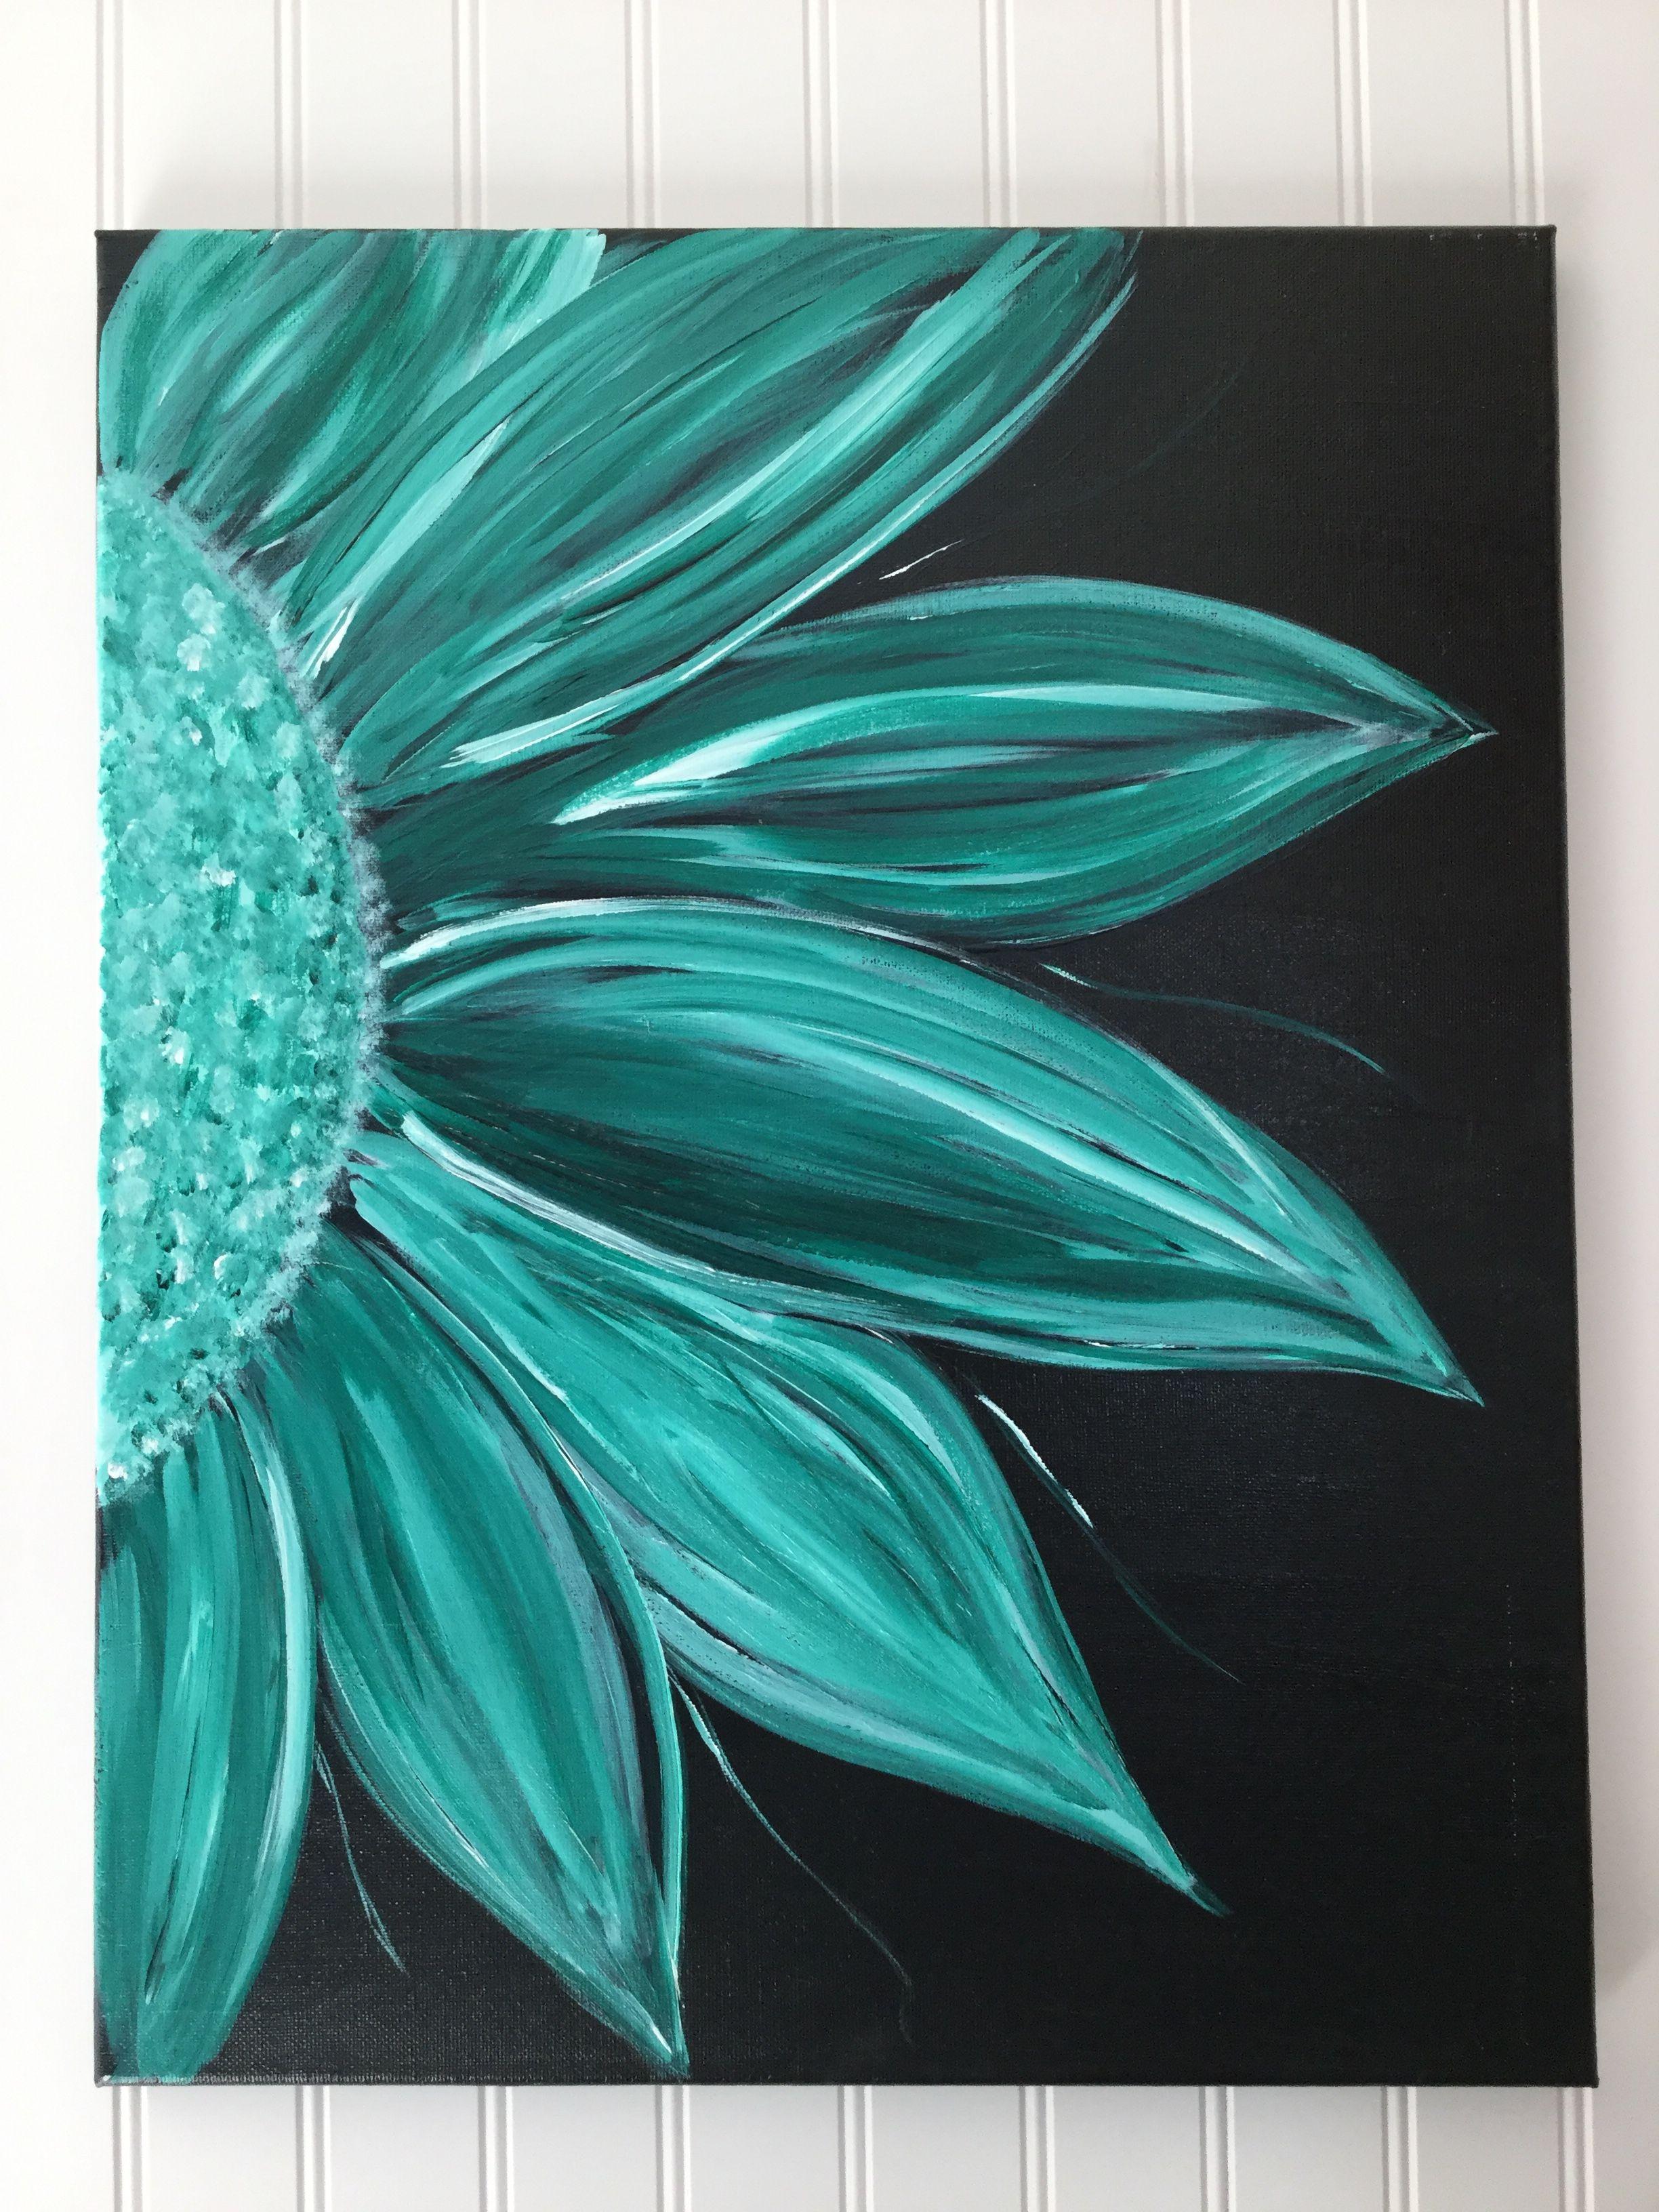 Acrylic Flower Painting On Black Background Simple Acrylic